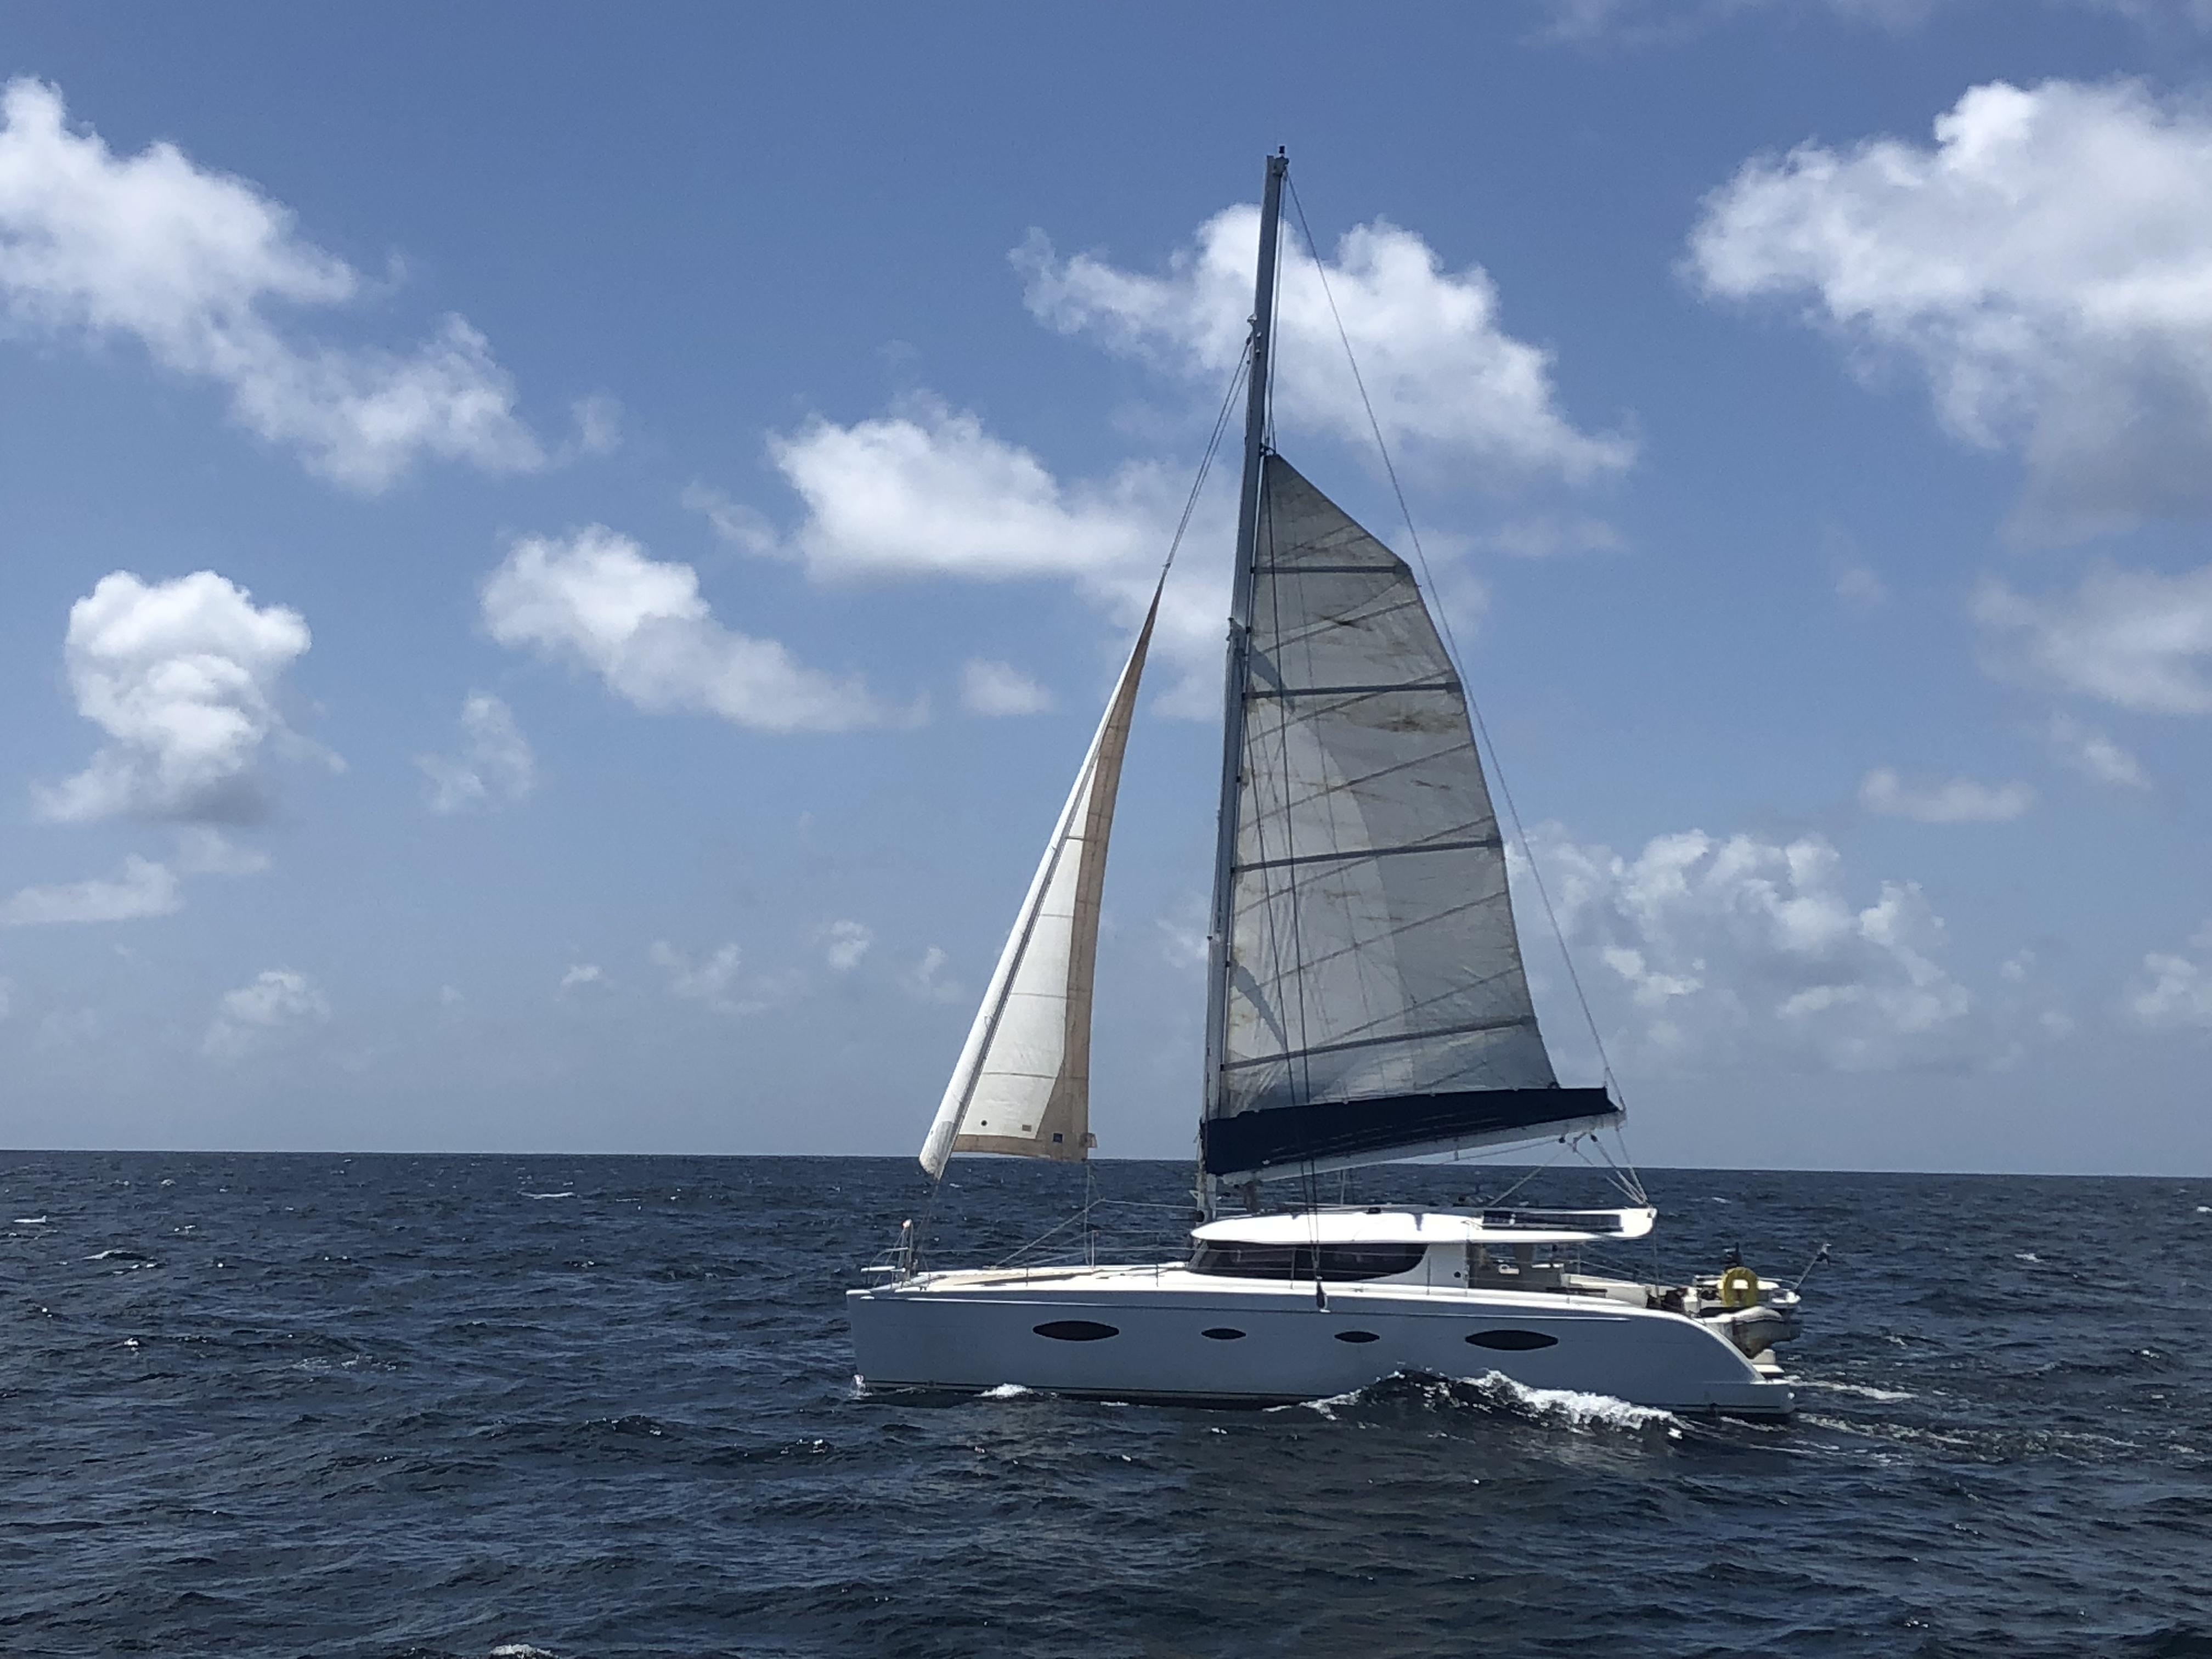 Panama, San Blas Islands. Catamar..